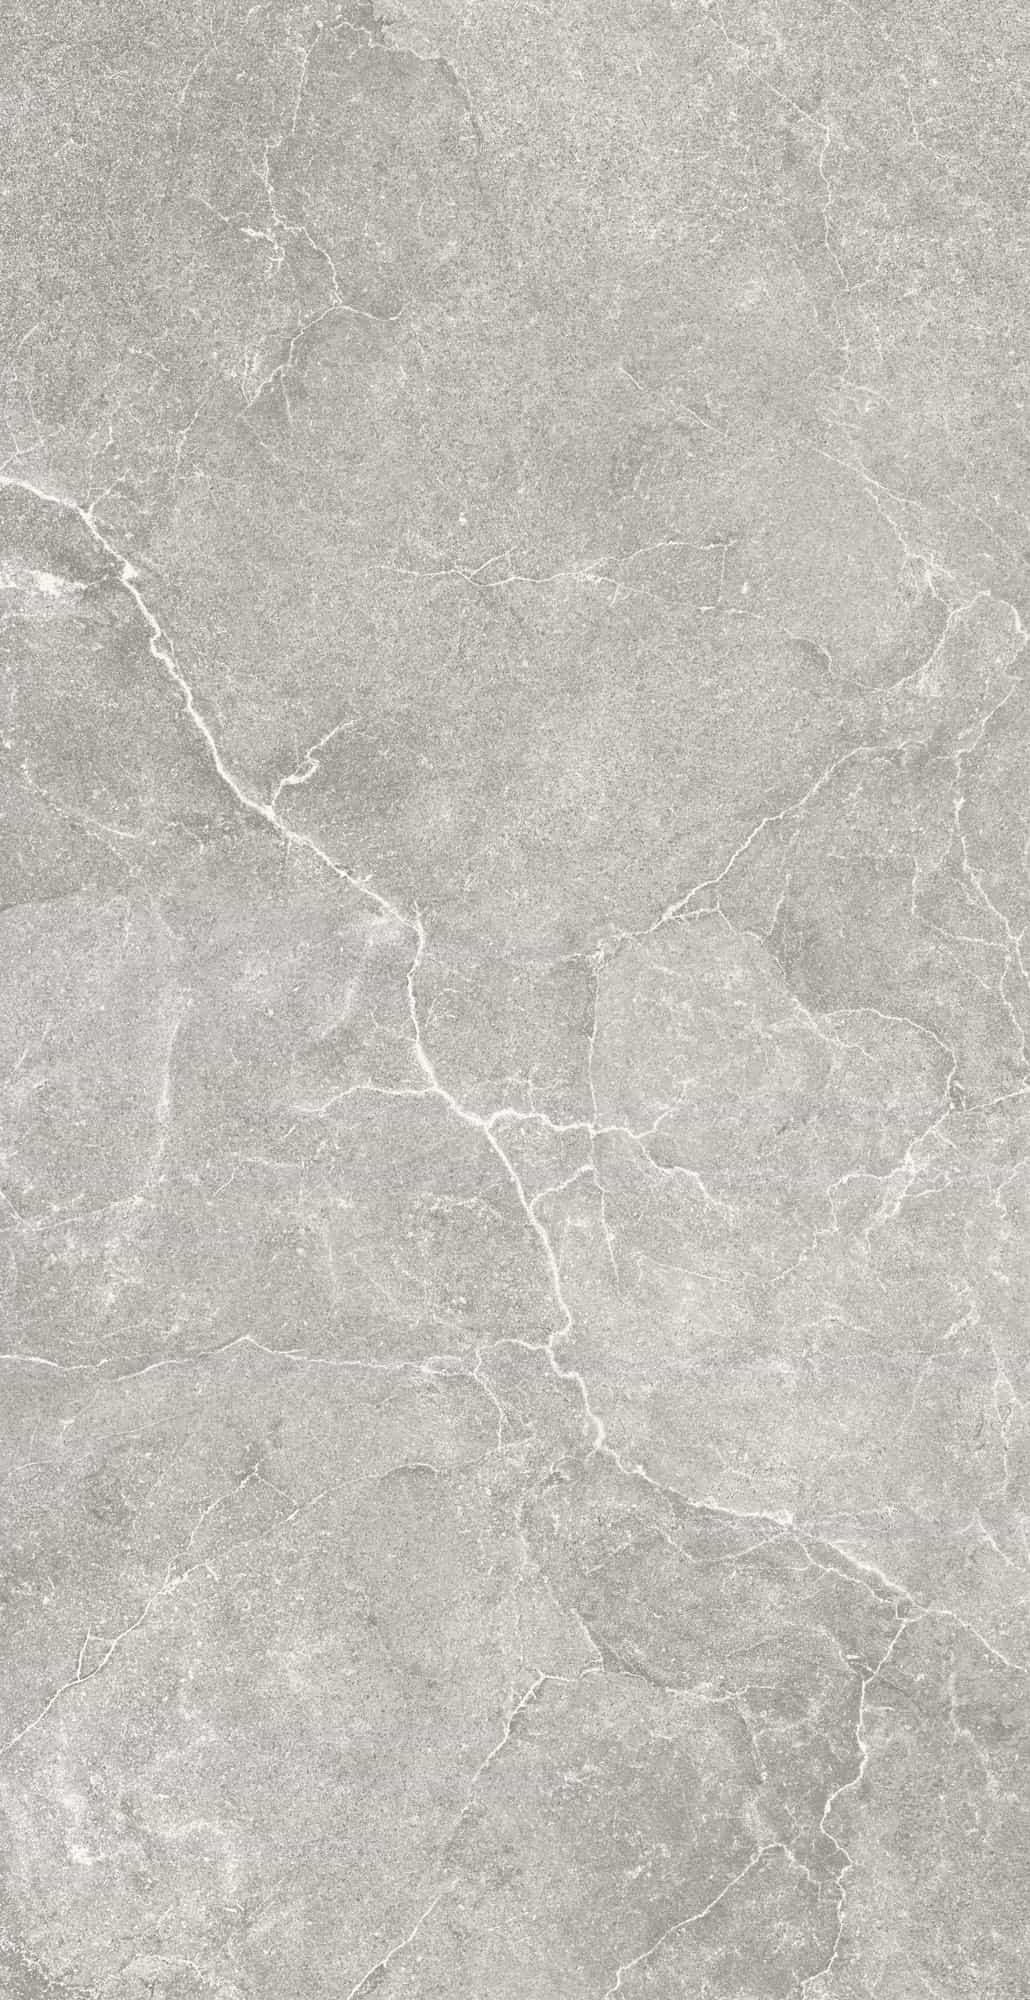 Wandtegels 90x90 - Lithos Stone - Lappato